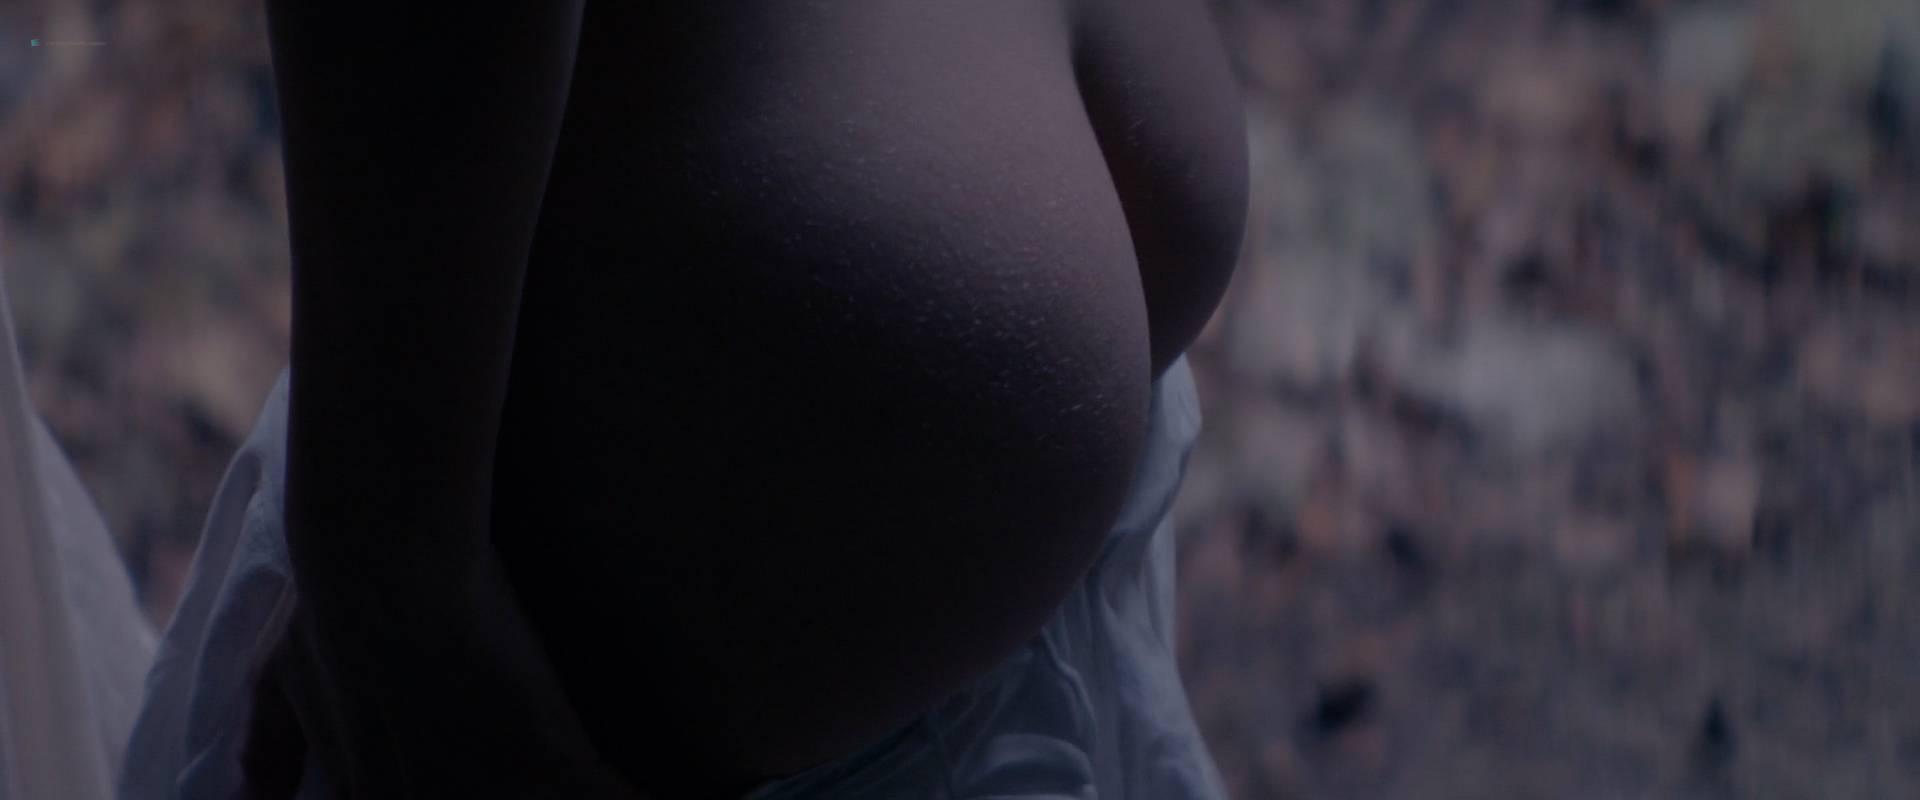 Bikini Butt Tamzin Merchant  naked (76 pictures), Snapchat, in bikini